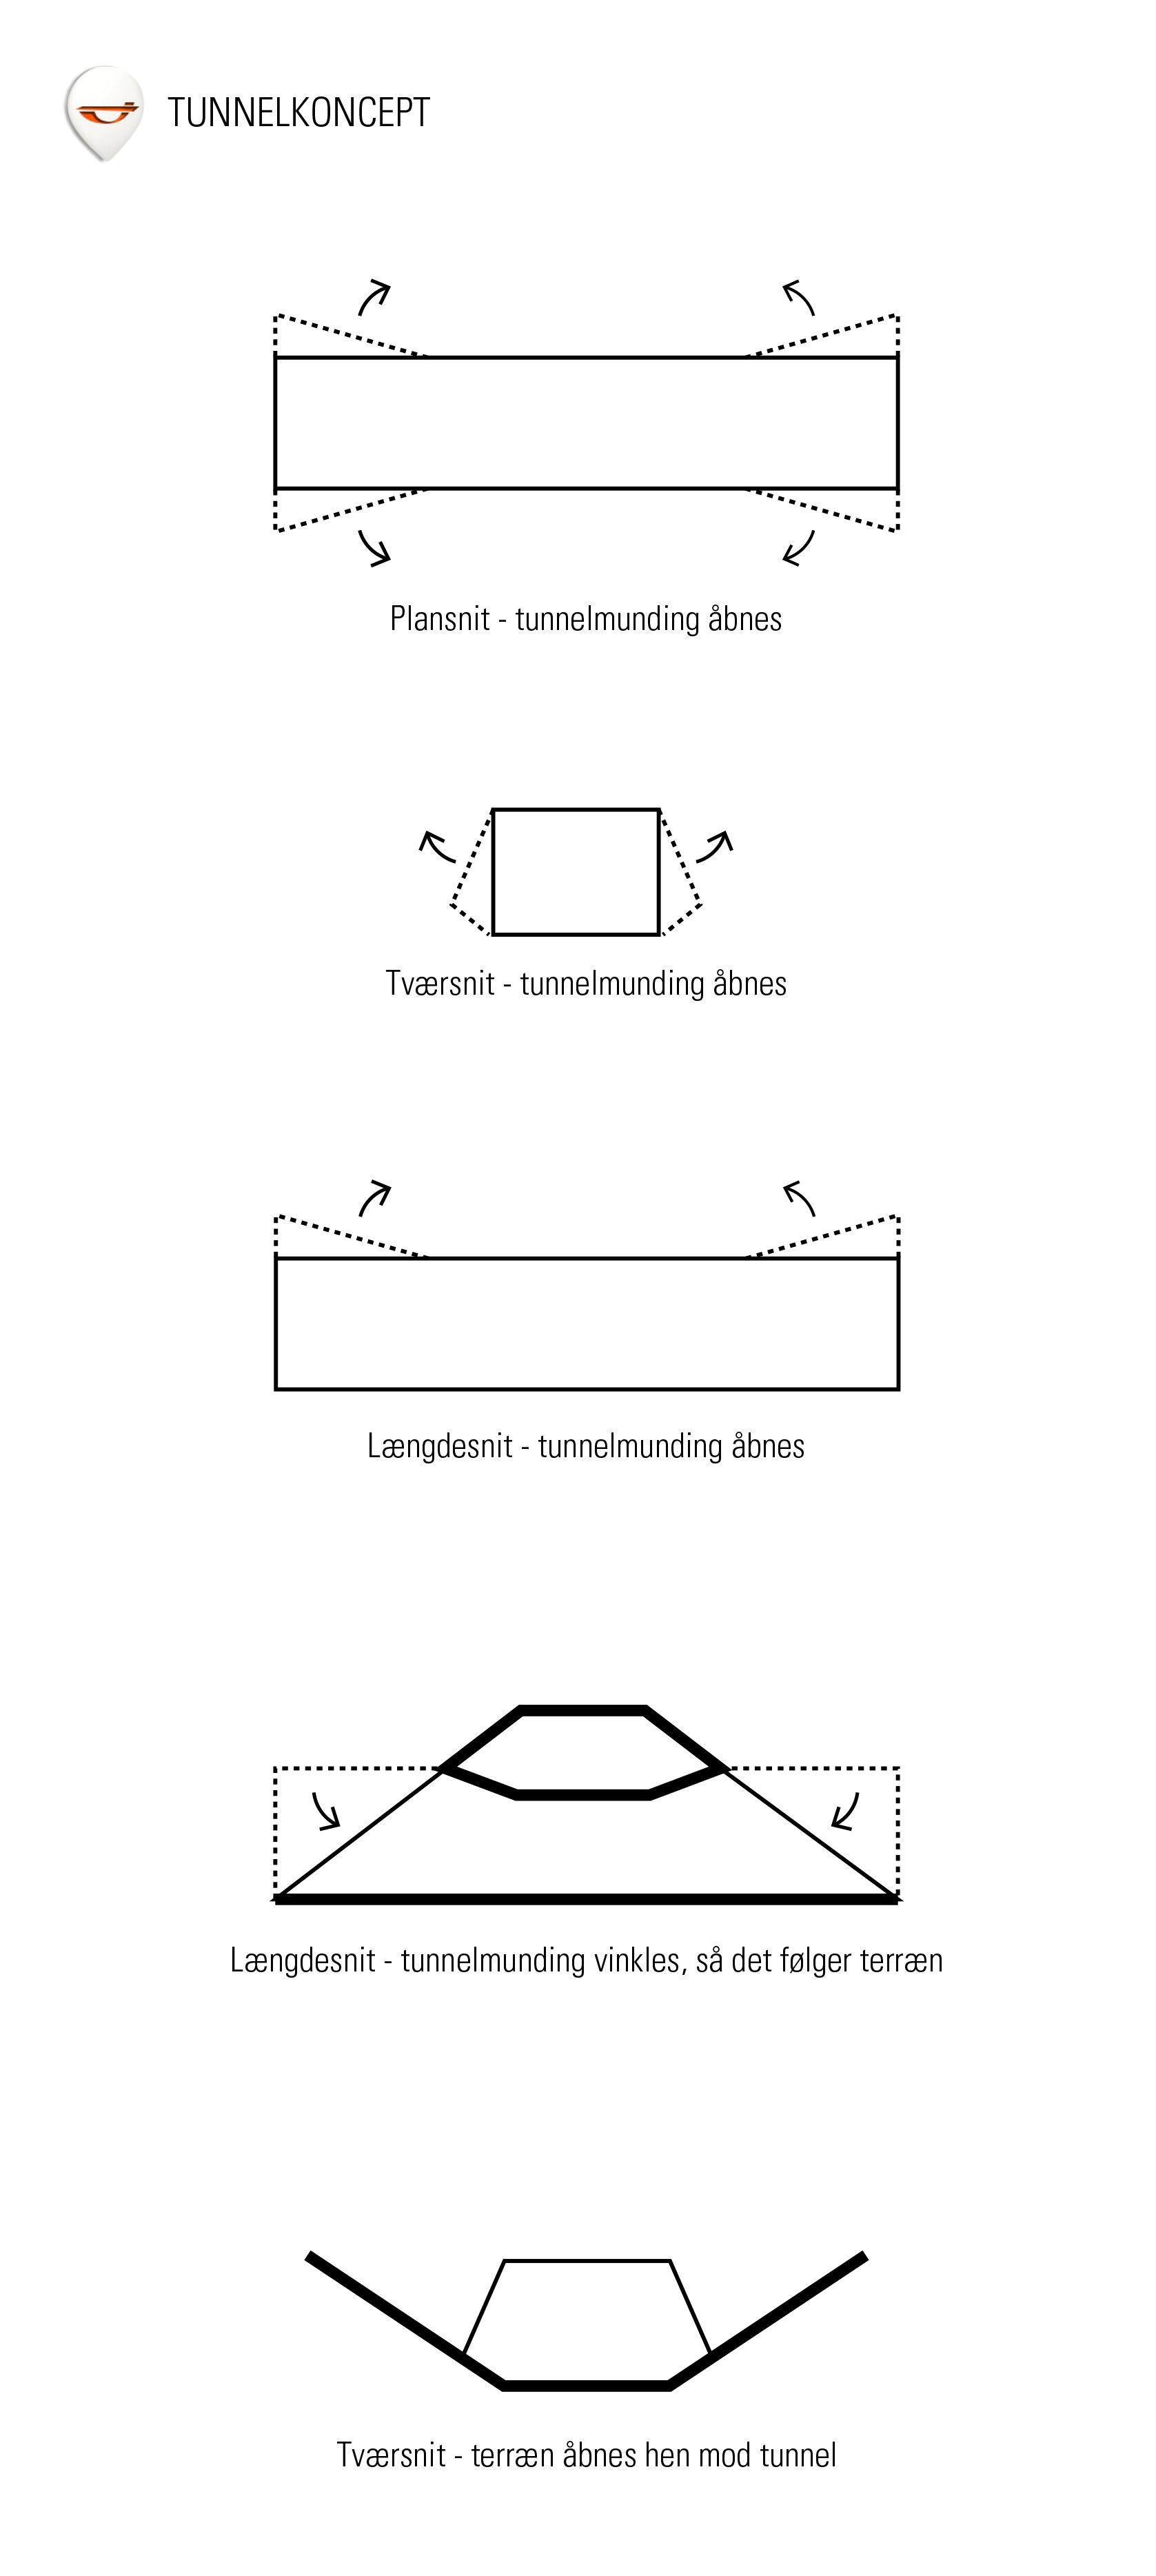 tunnel_koncept_diagrammer.jpg